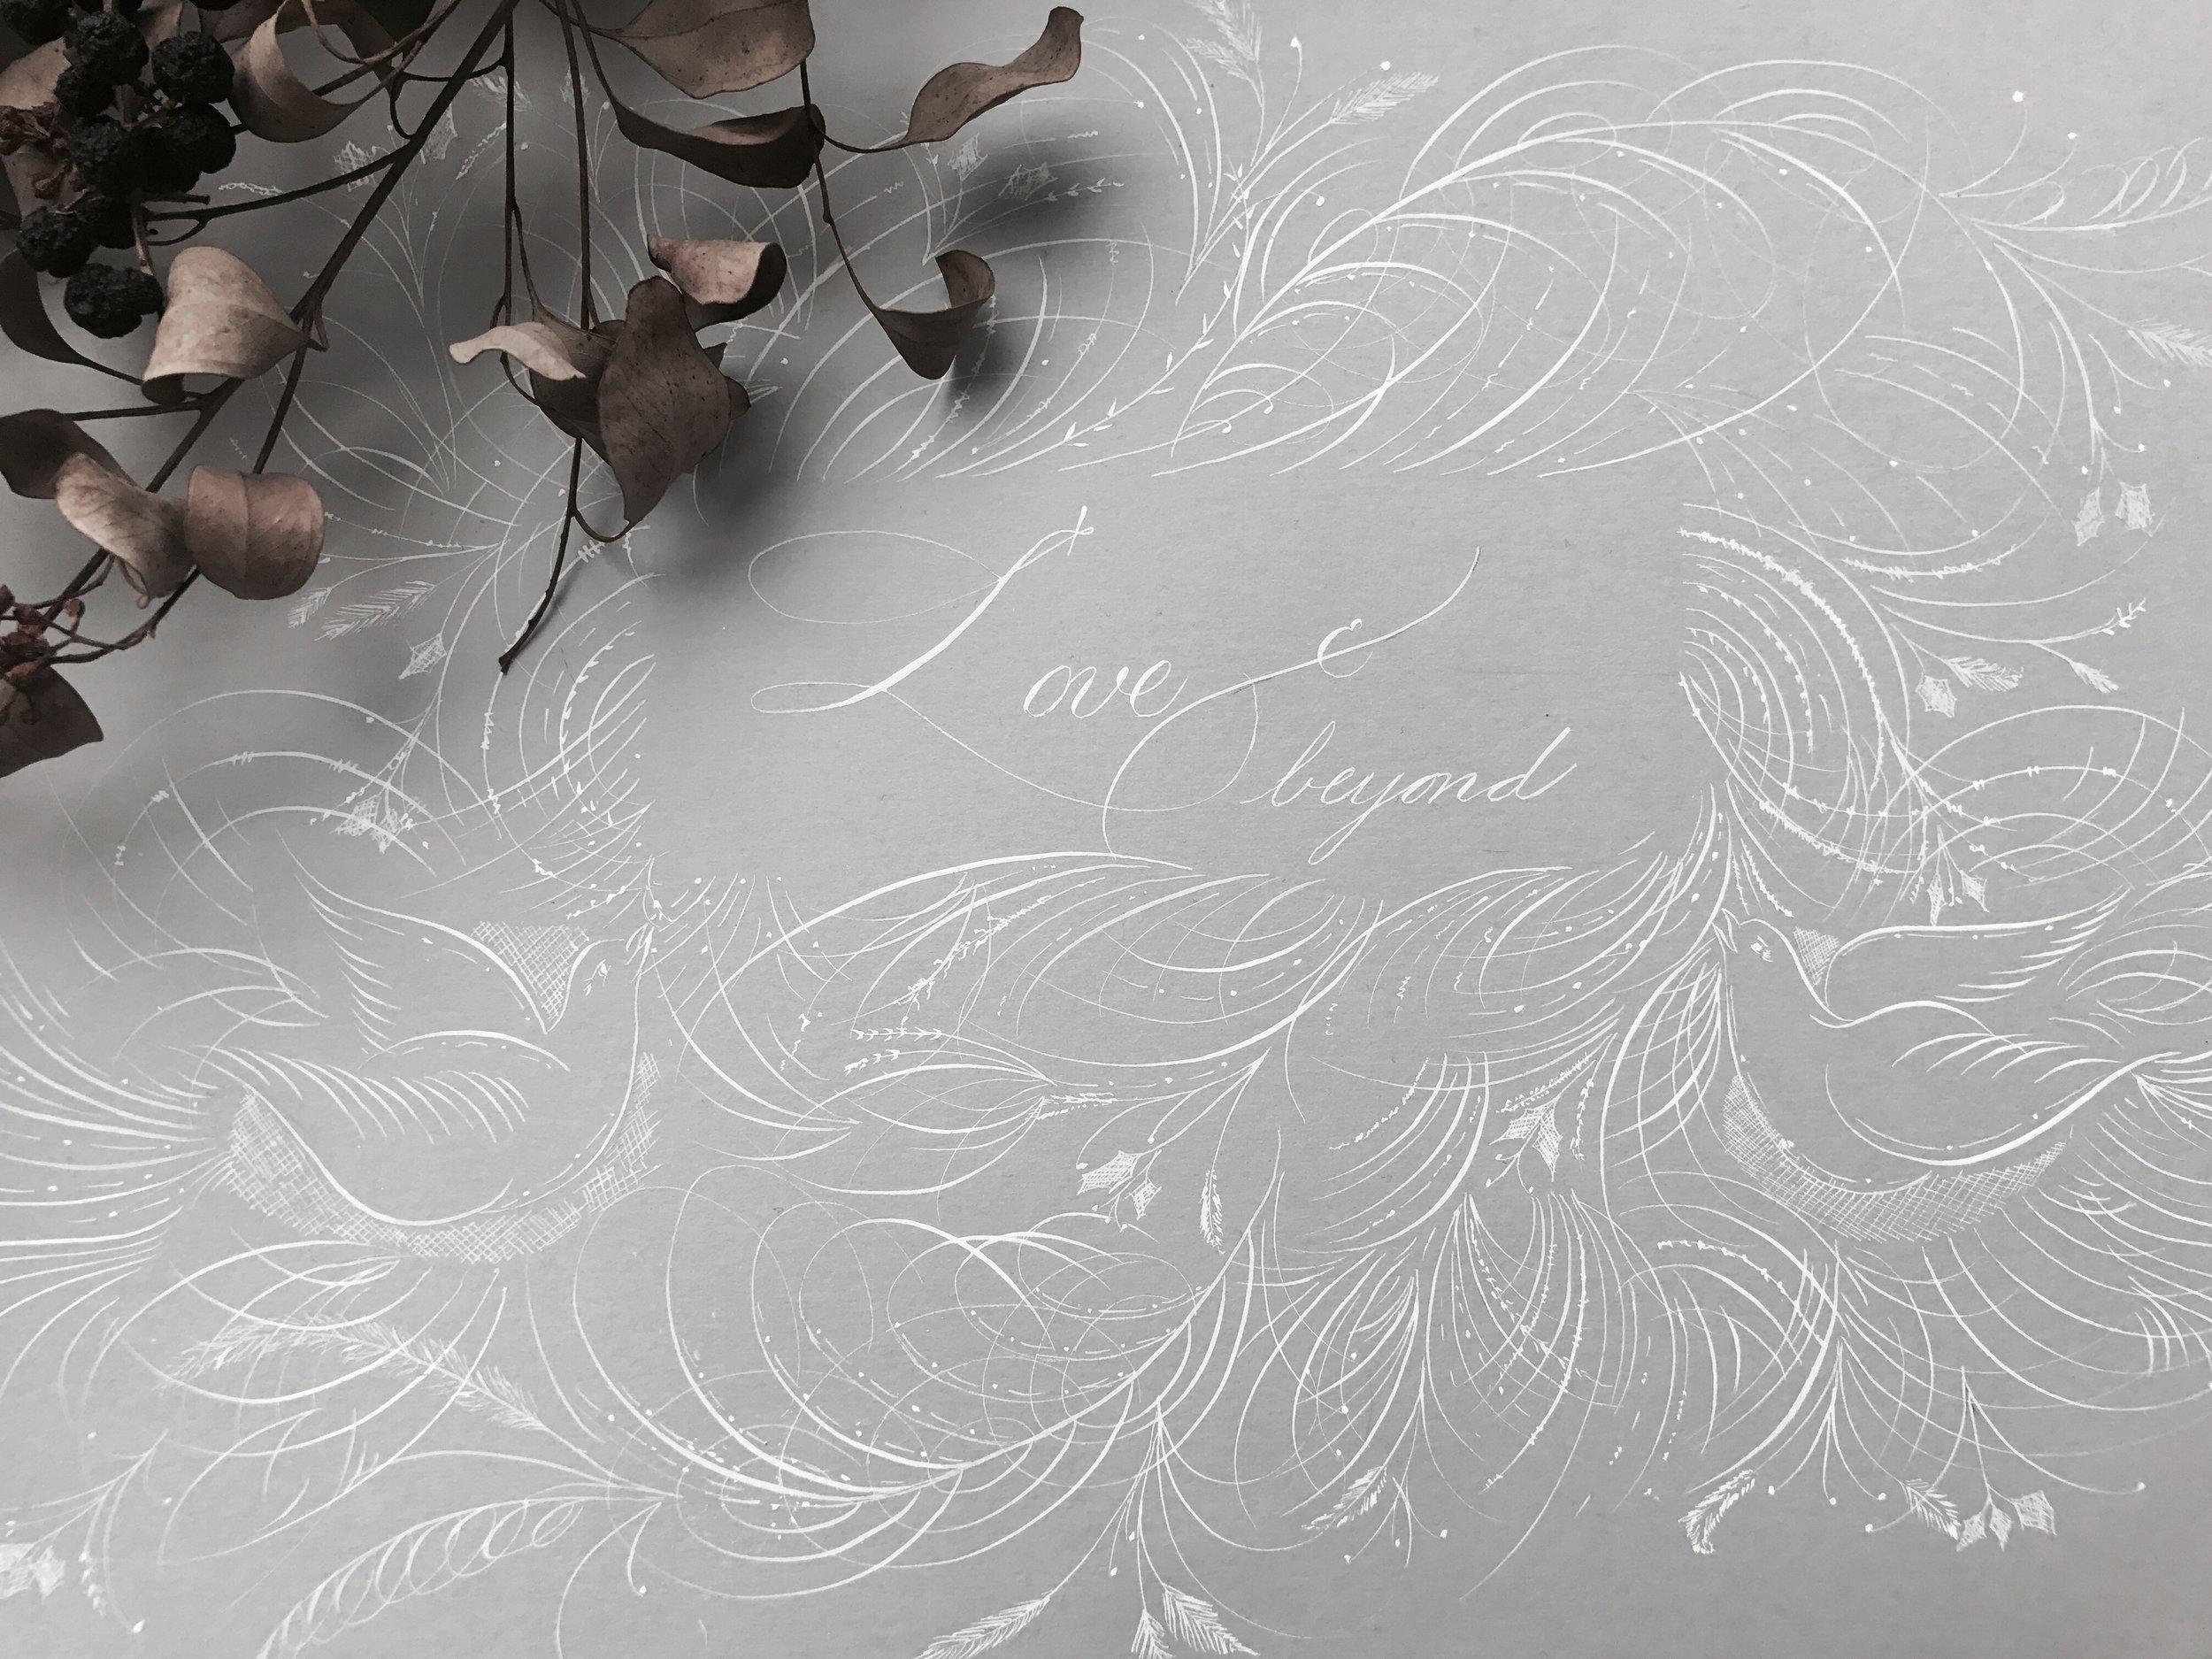 (Artwork) Offhand flourishing.jpg